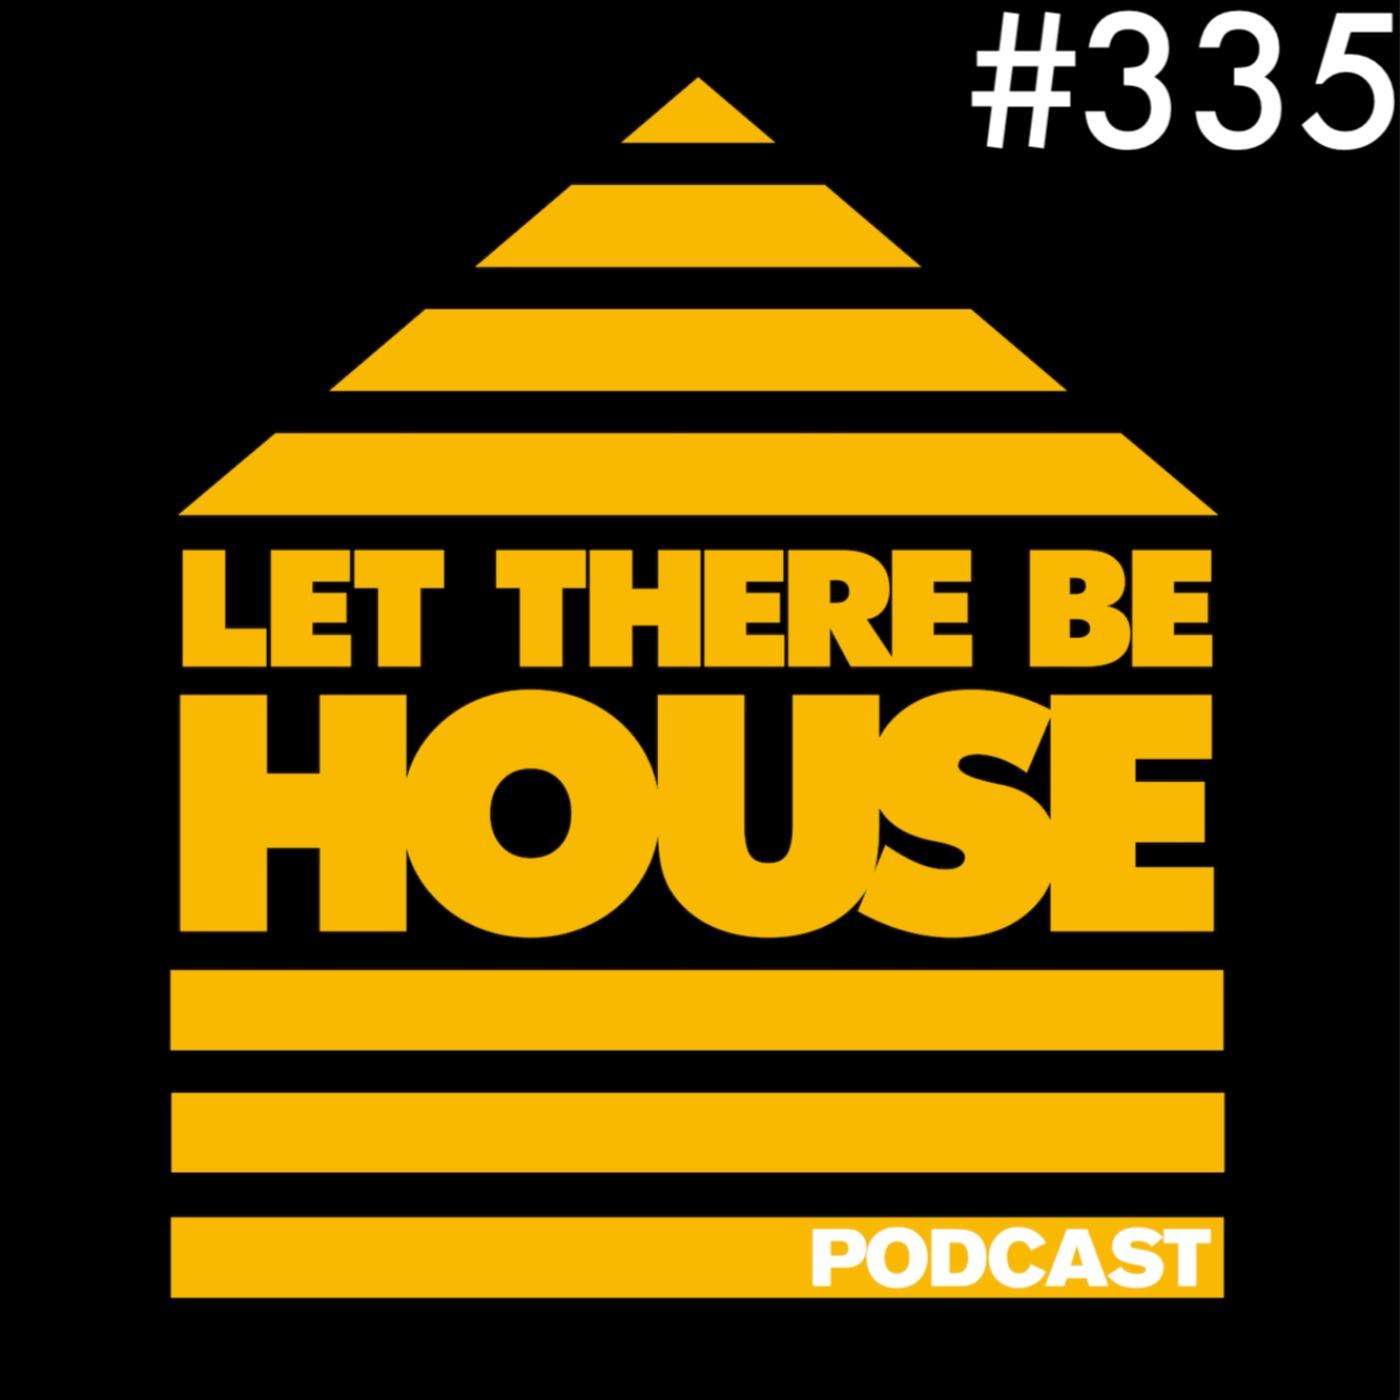 LTBH #335 with Glen Horsborough